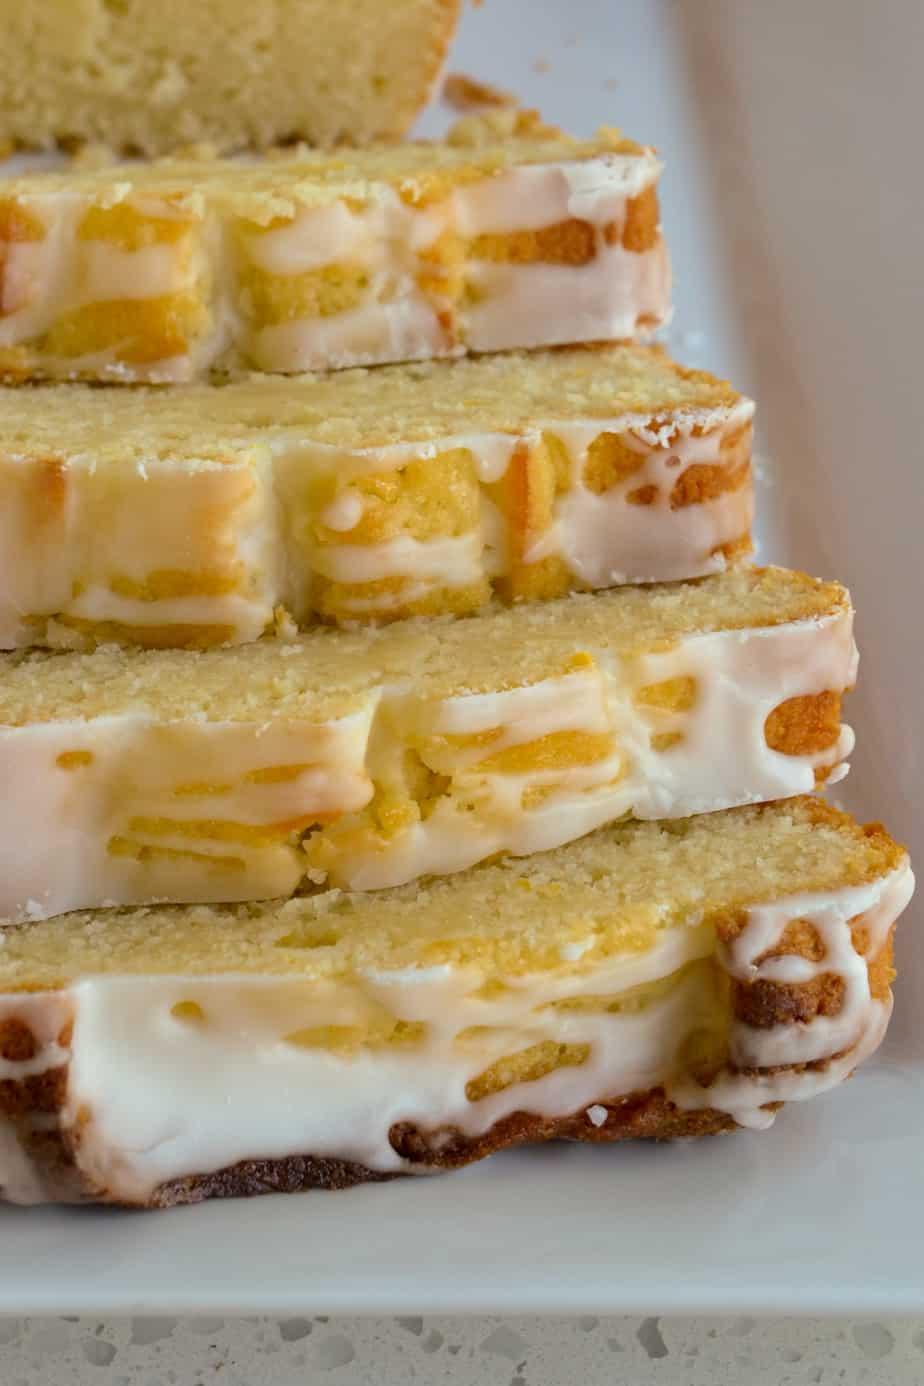 Slices of lemon glazed pound cake